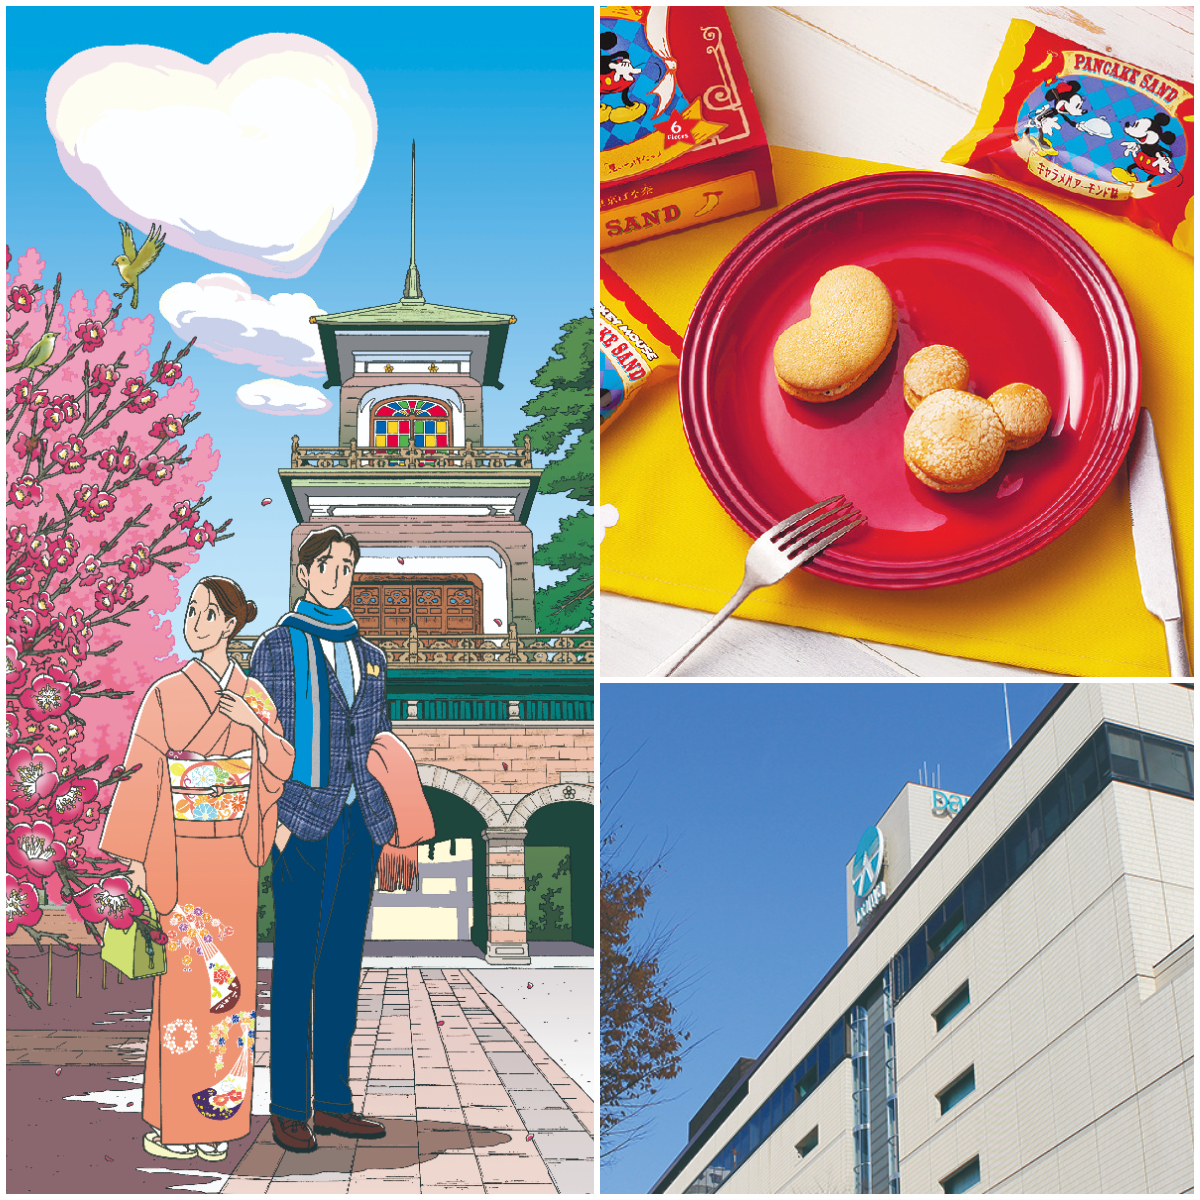 「ONE PIECE 麦わらストア」など年末年始もイベント満載の『香林坊大和』